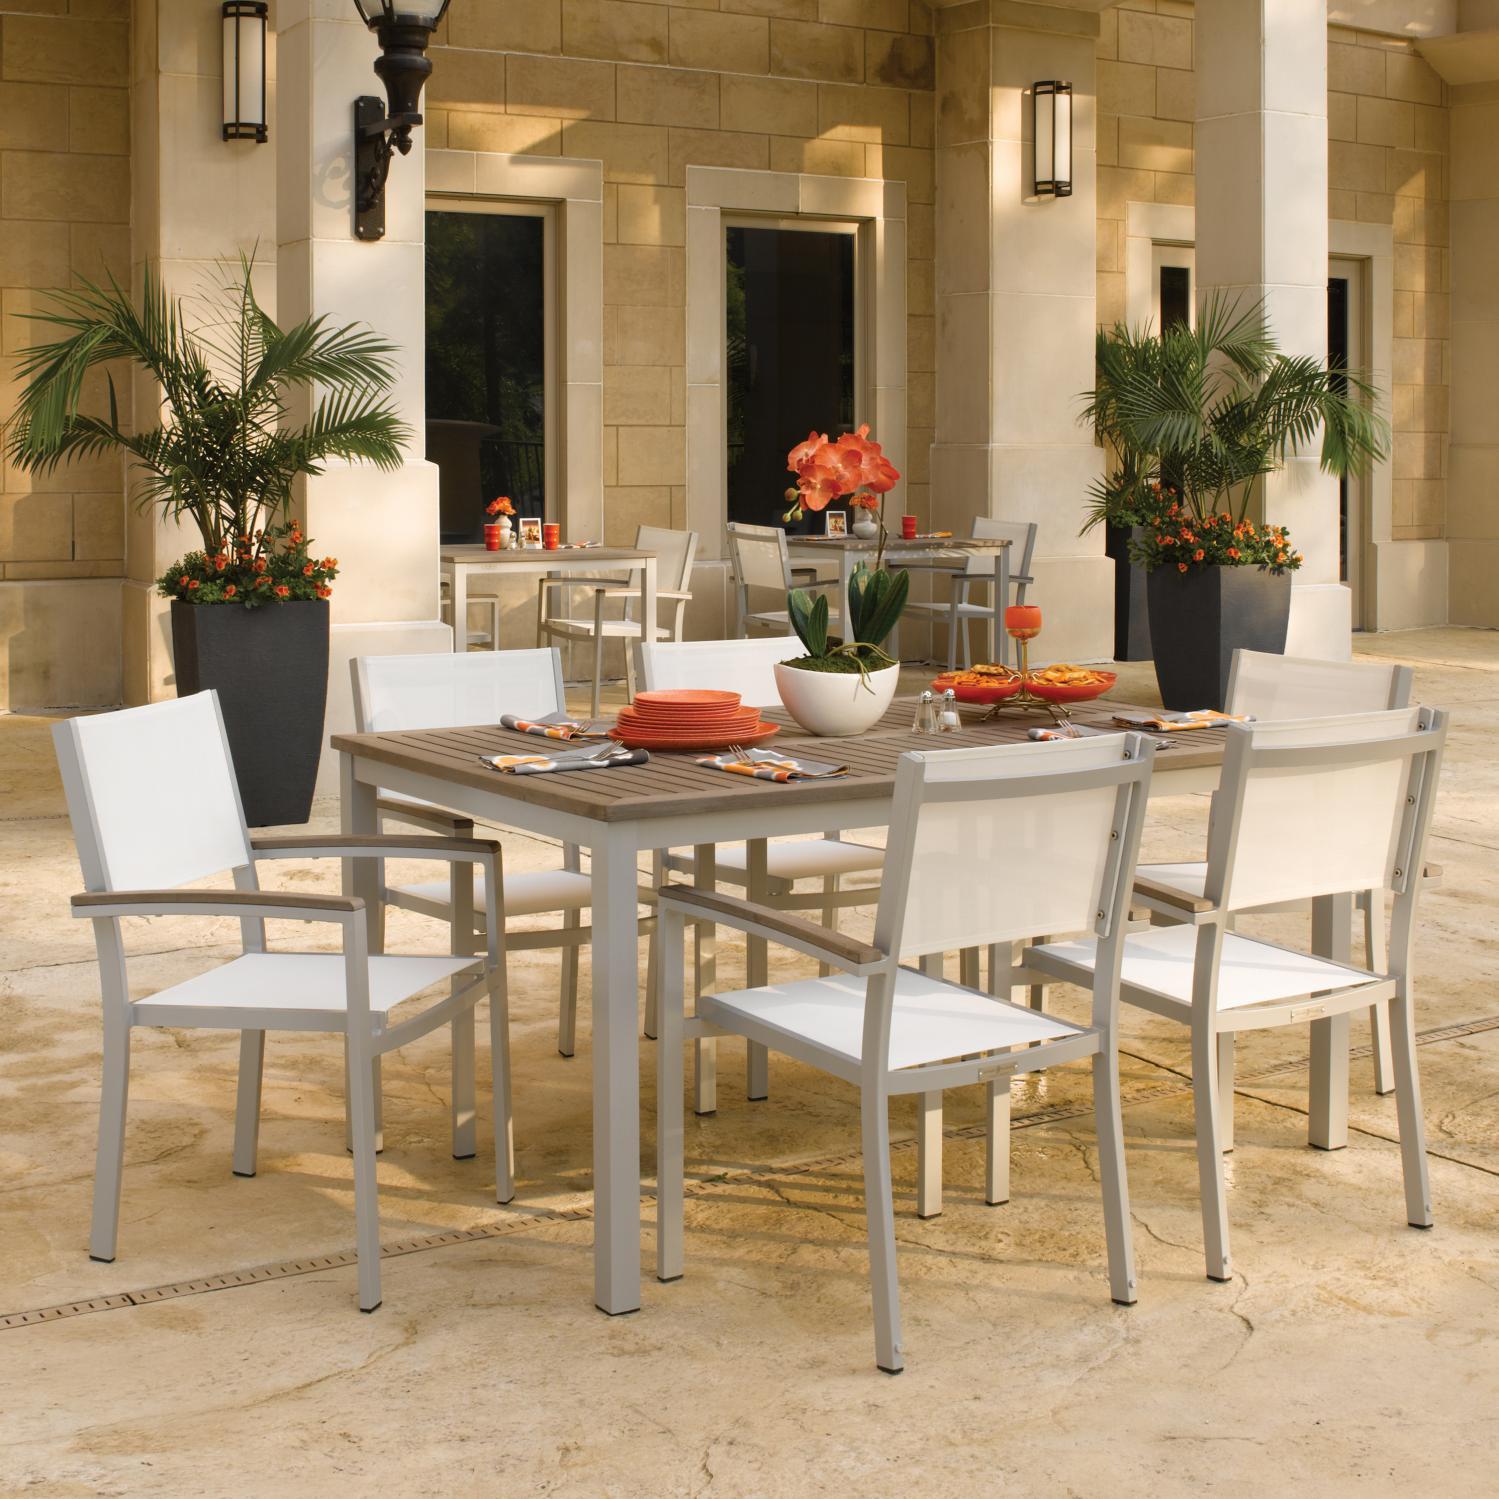 Oxford Garden Designs Travira 7 Piece Aluminum Patio Dini...